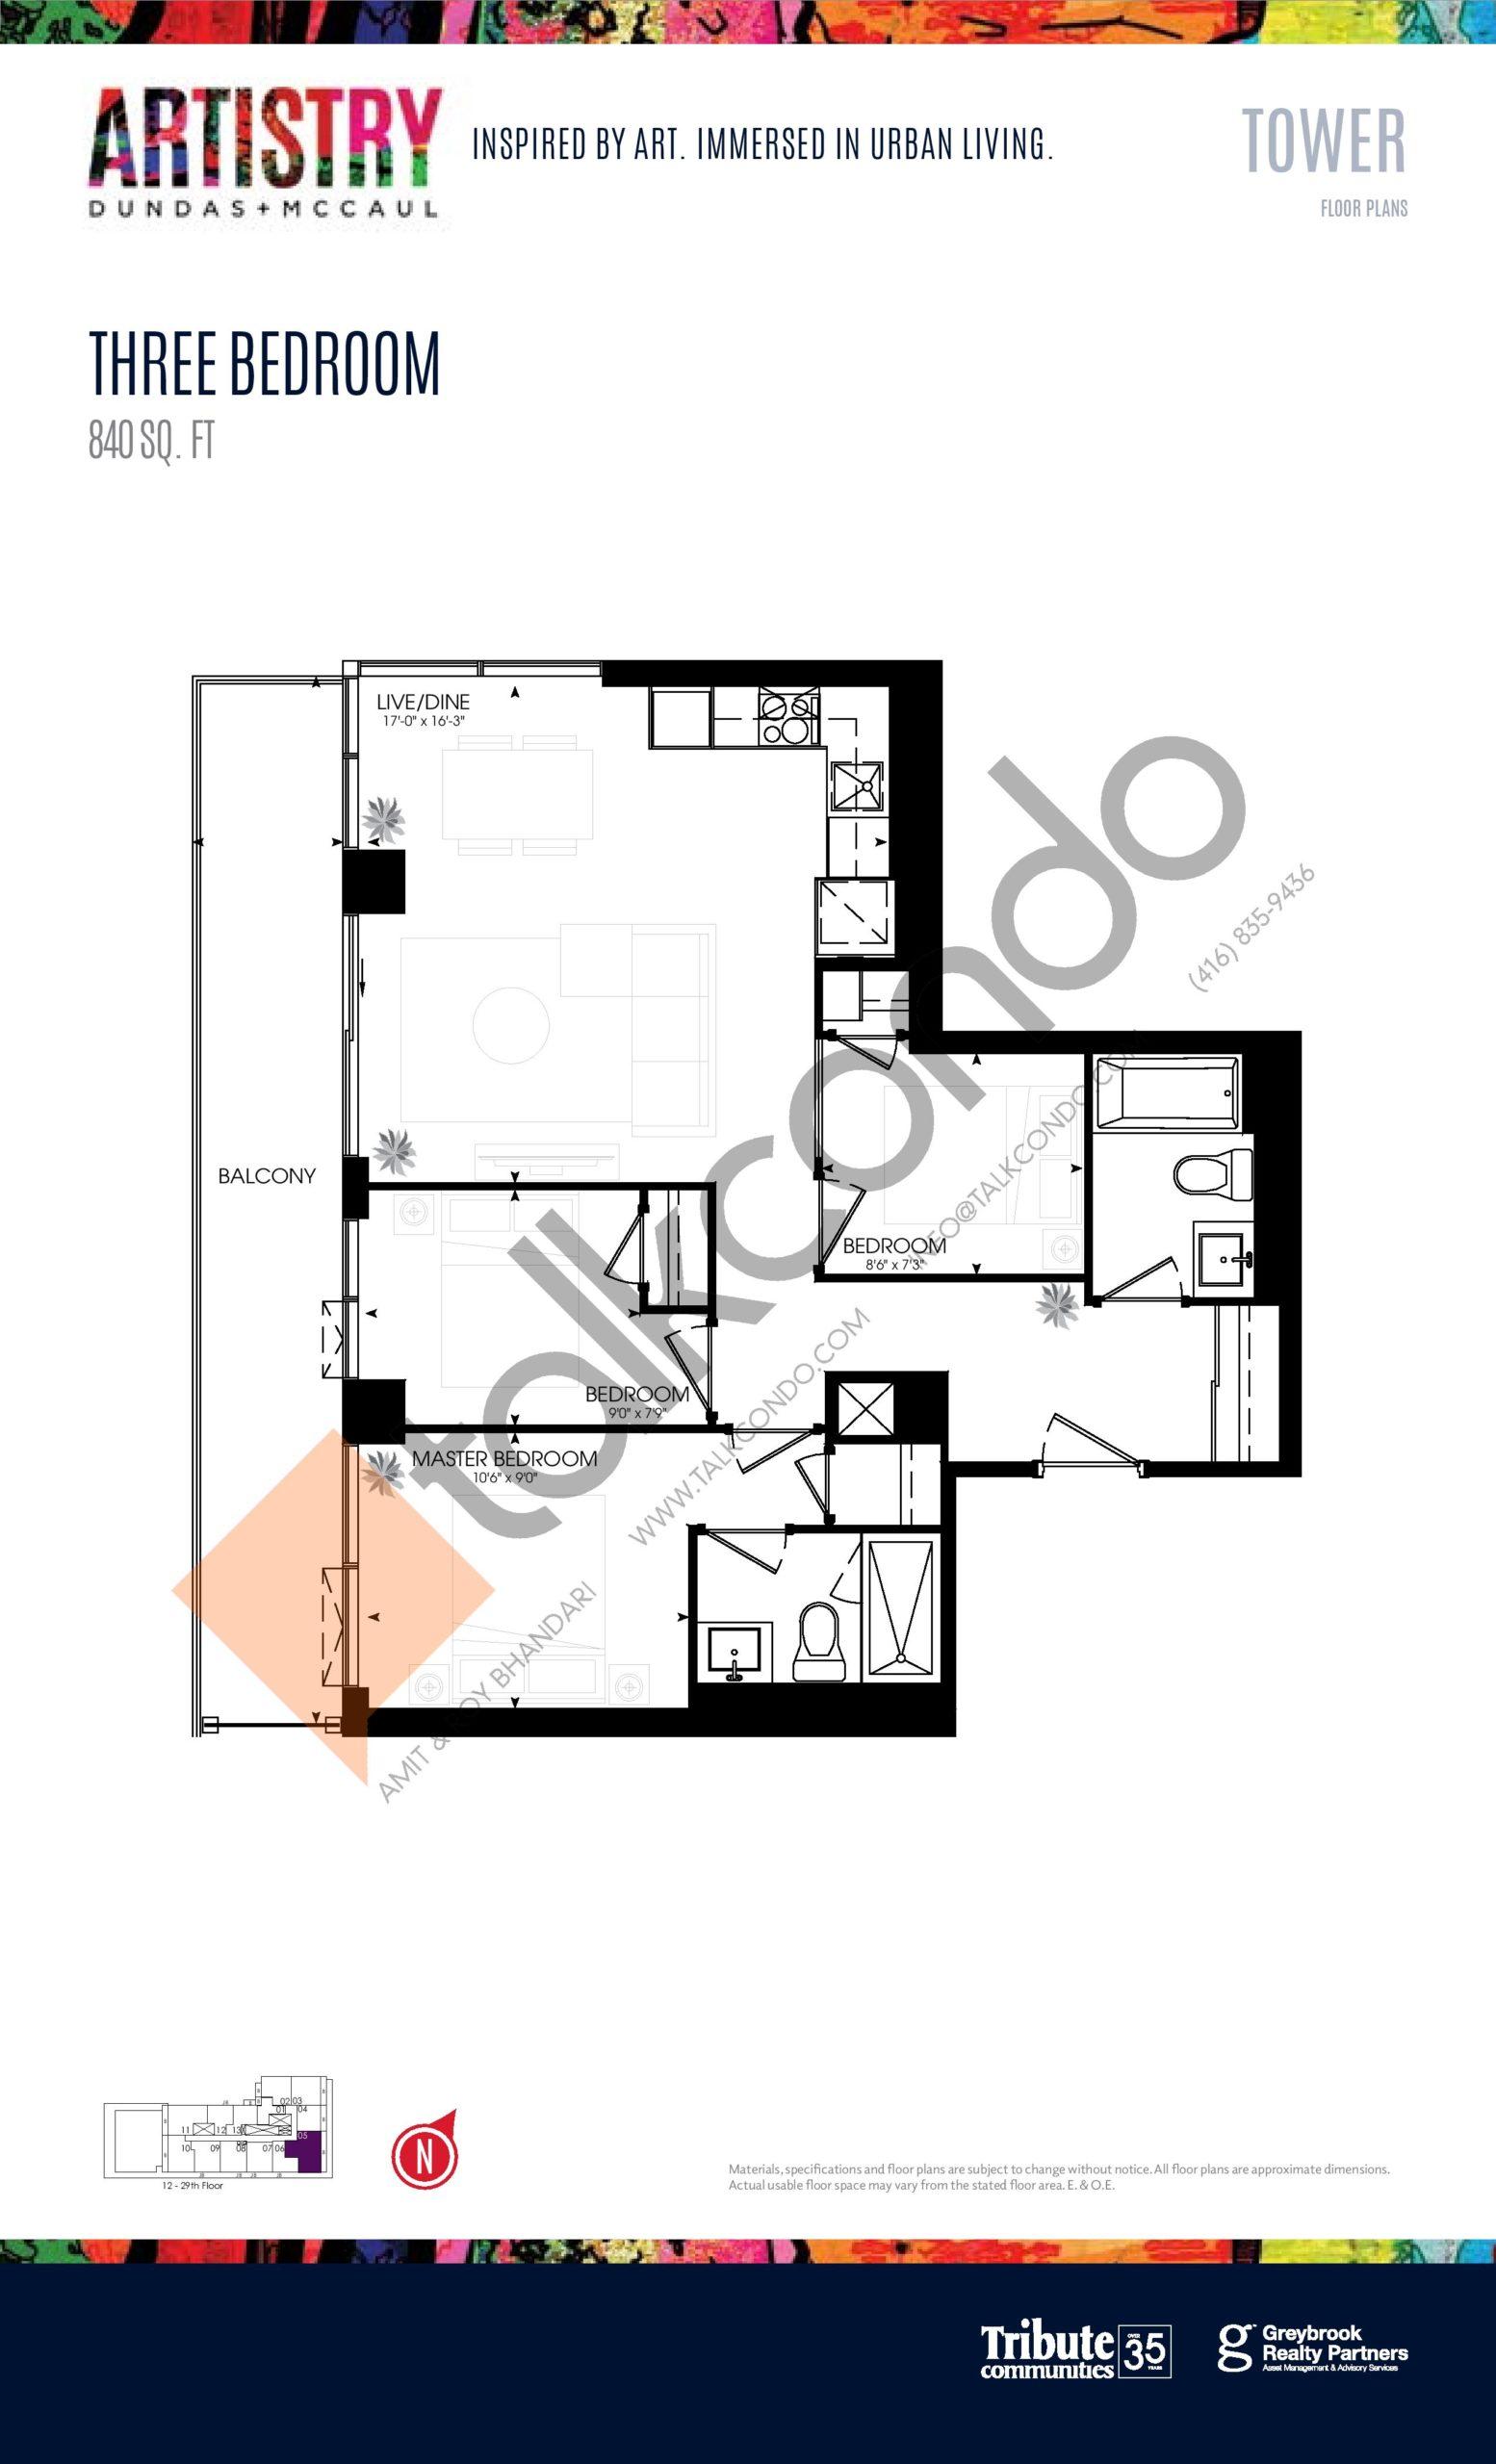 840 sq. ft. - Tower Floor Plan at Artistry Condos - 840 sq.ft